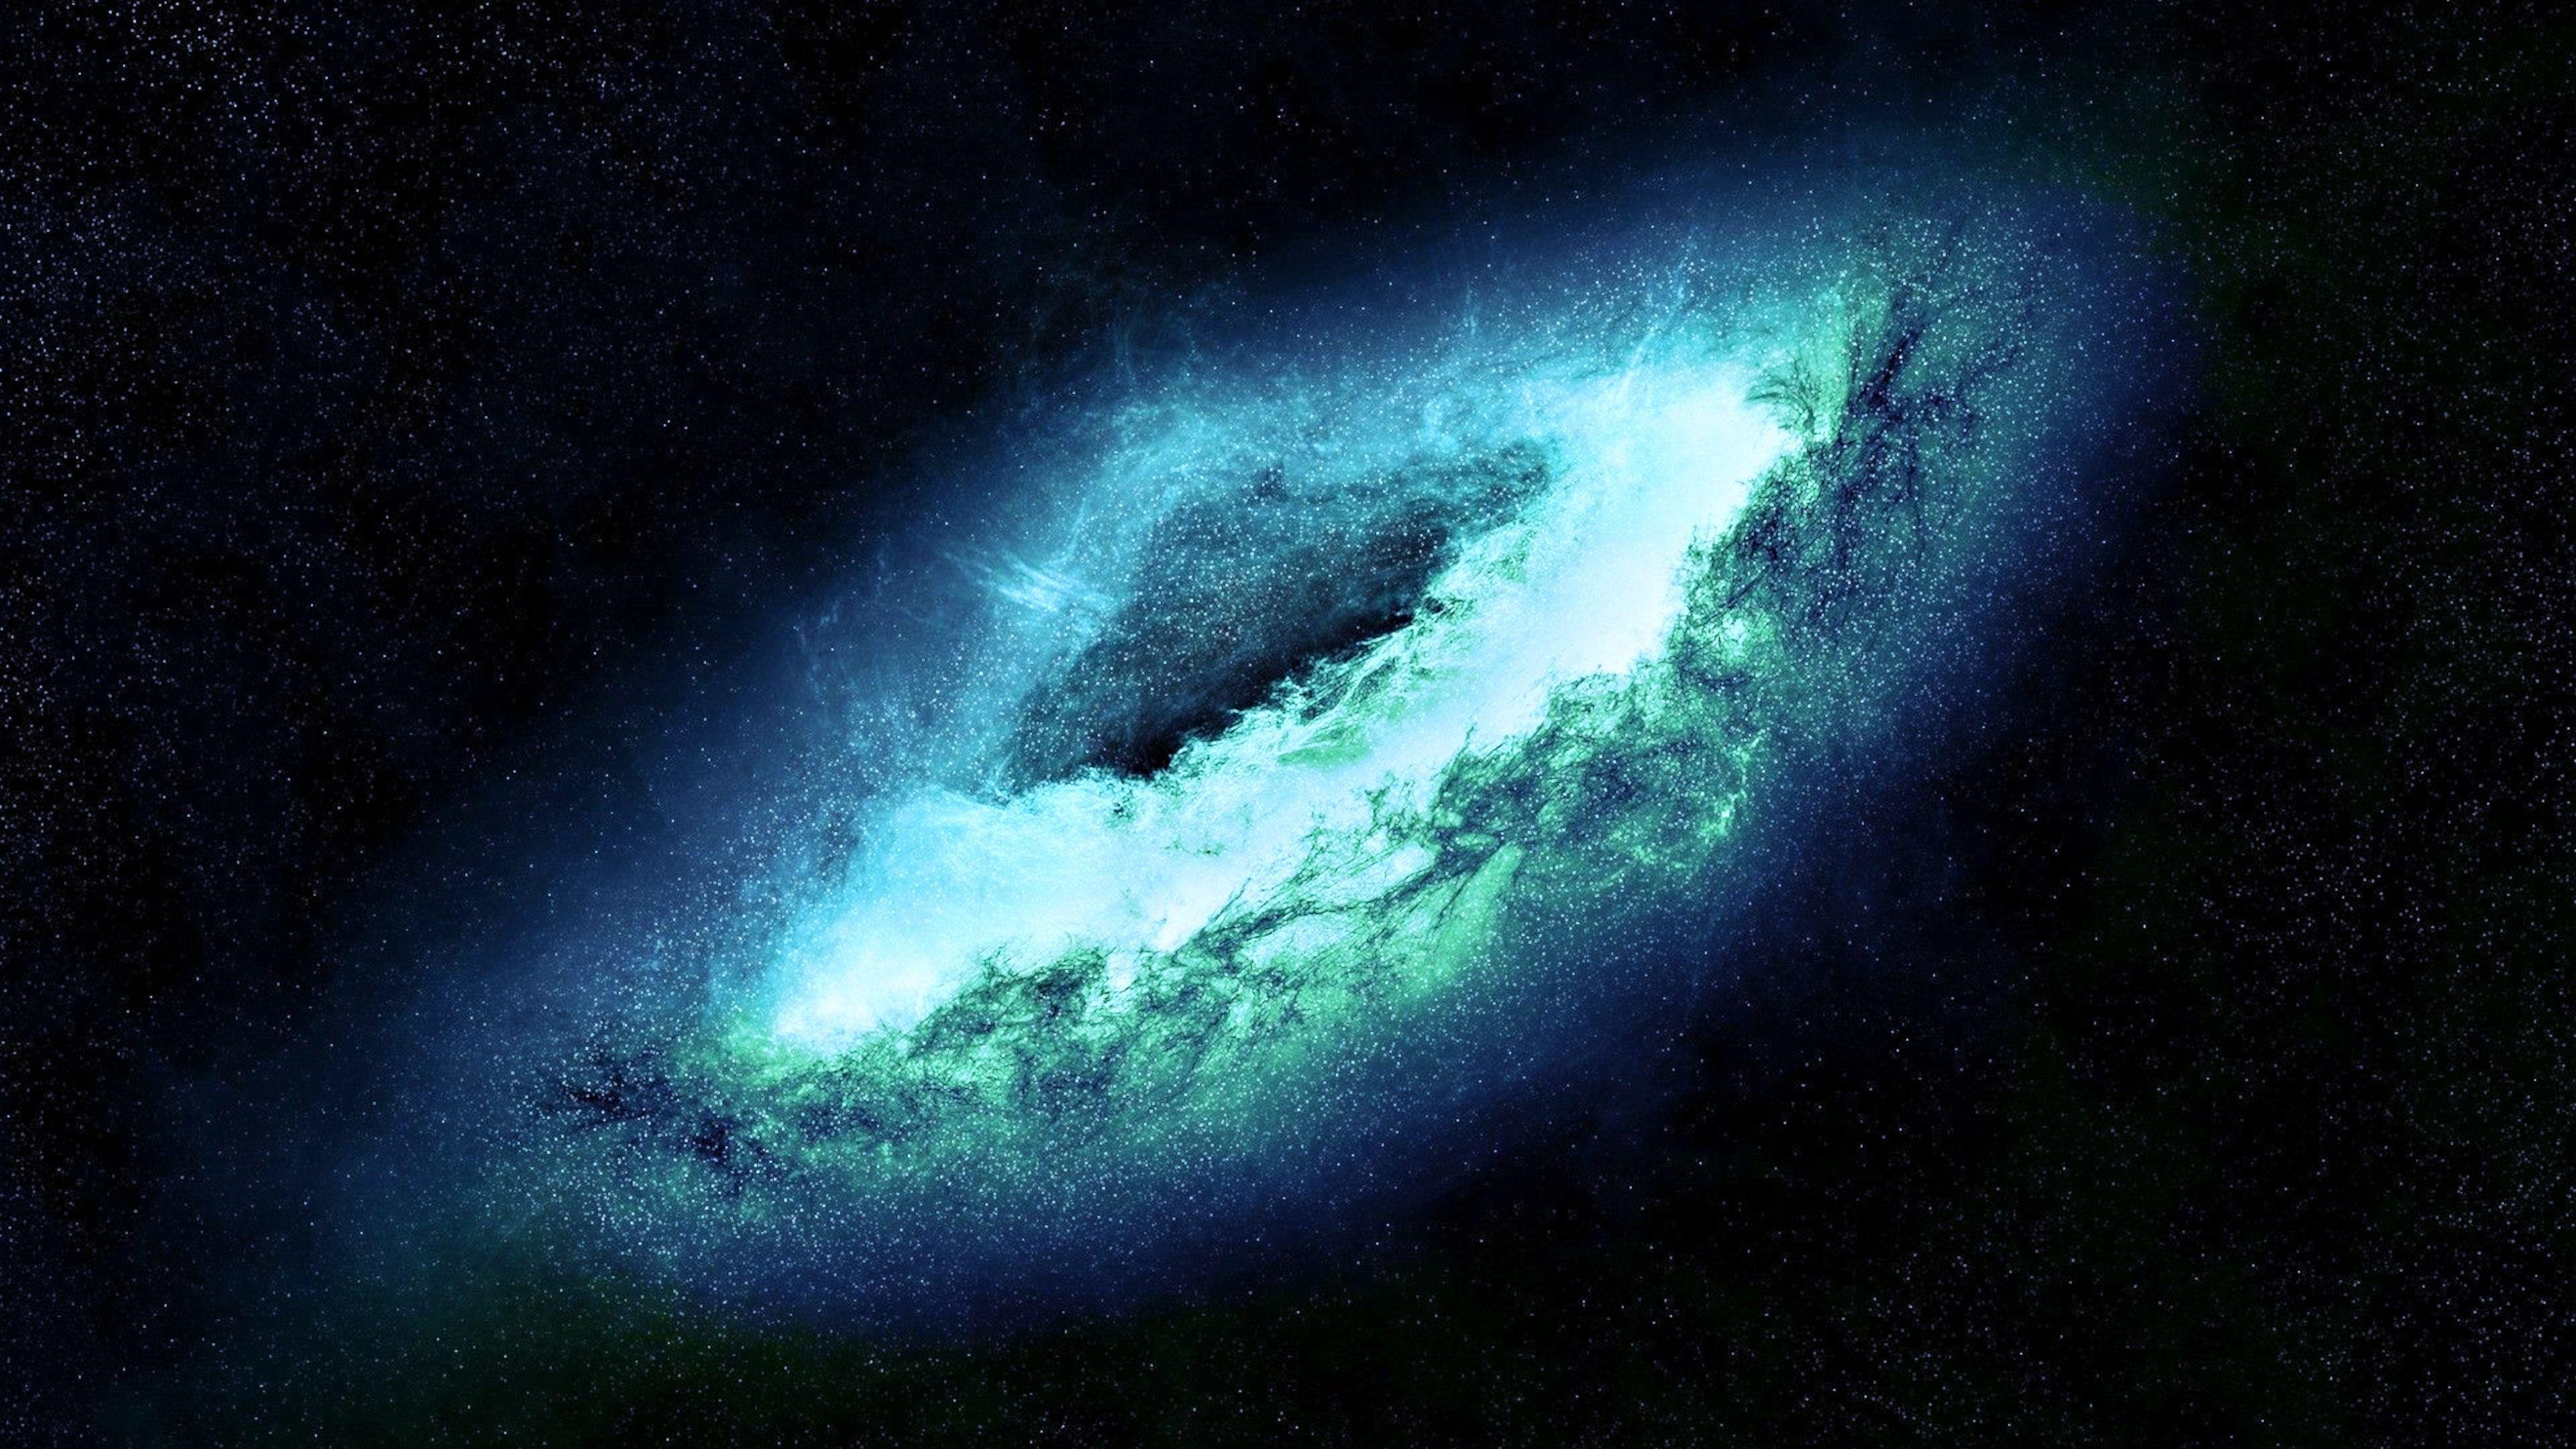 Blue Galaxy Ultra Hd 4k Wallpaper Jpg 3840 2160 Blue Galaxy Wallpaper Galaxy Wallpaper Milky Way Photography